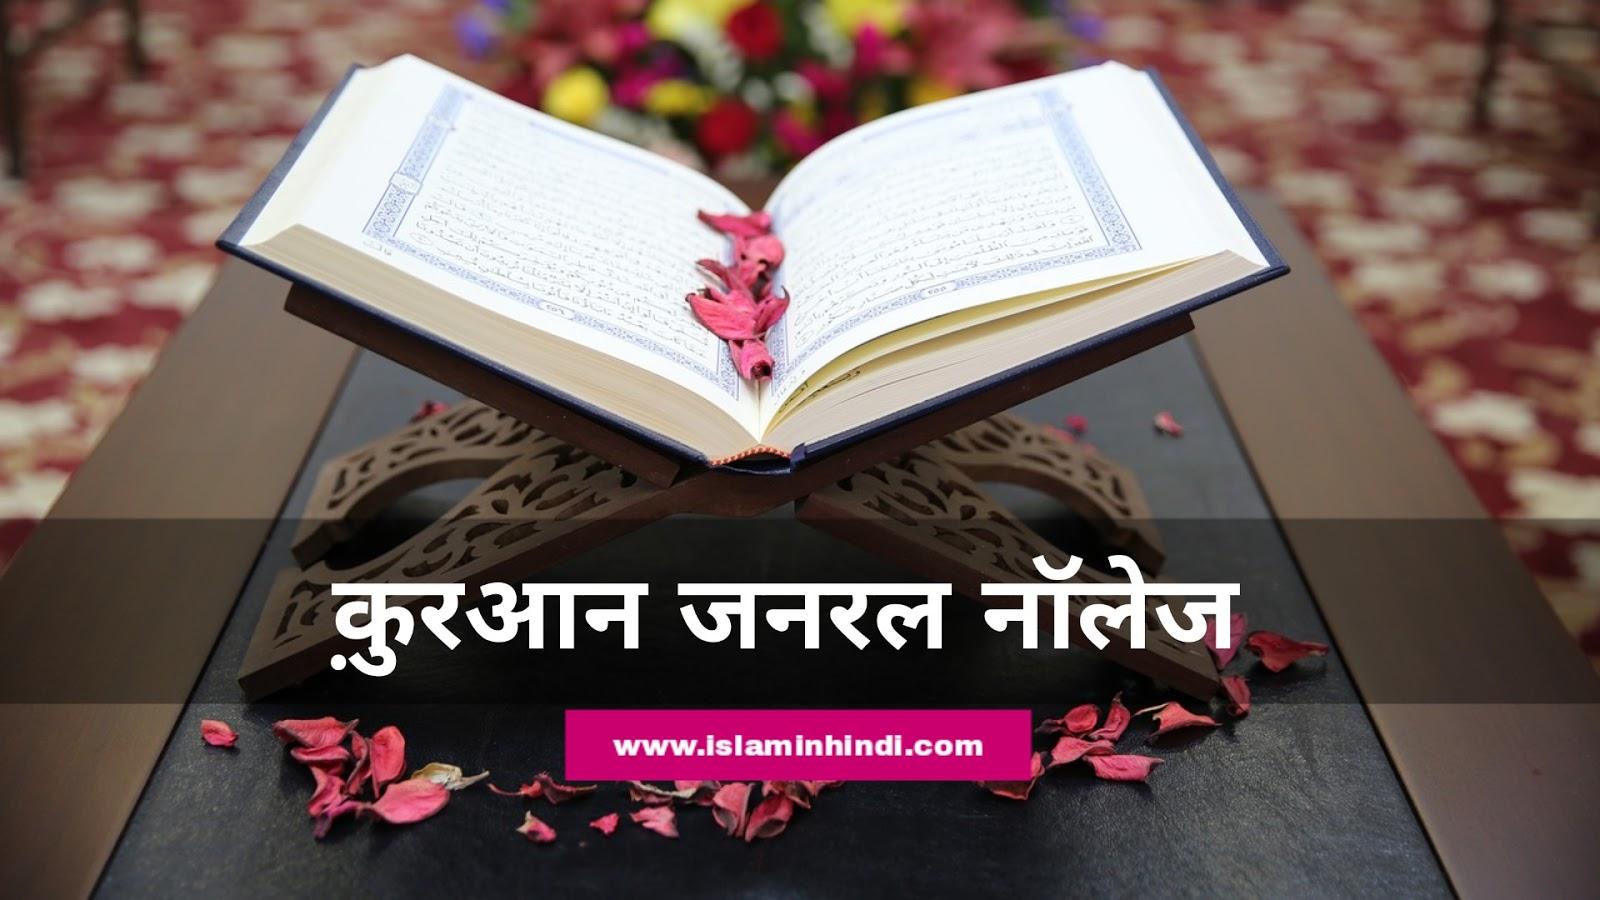 Quran general knowledge in hindi